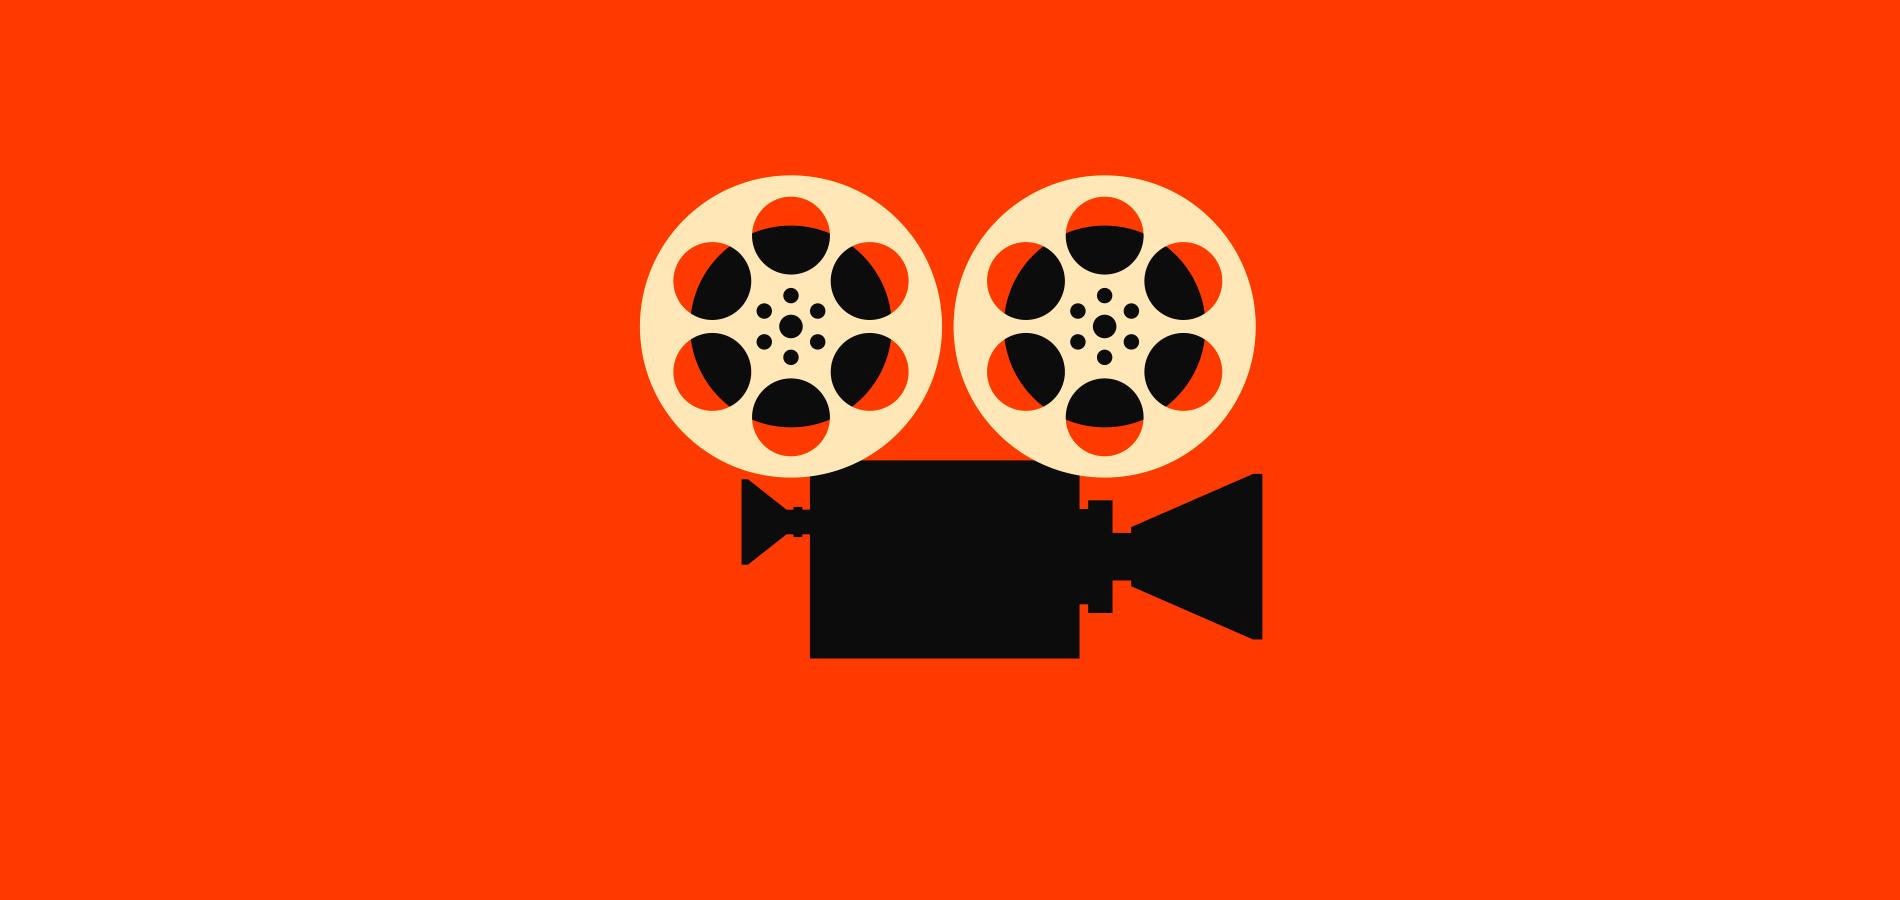 8 groundbreaking businesses in movies